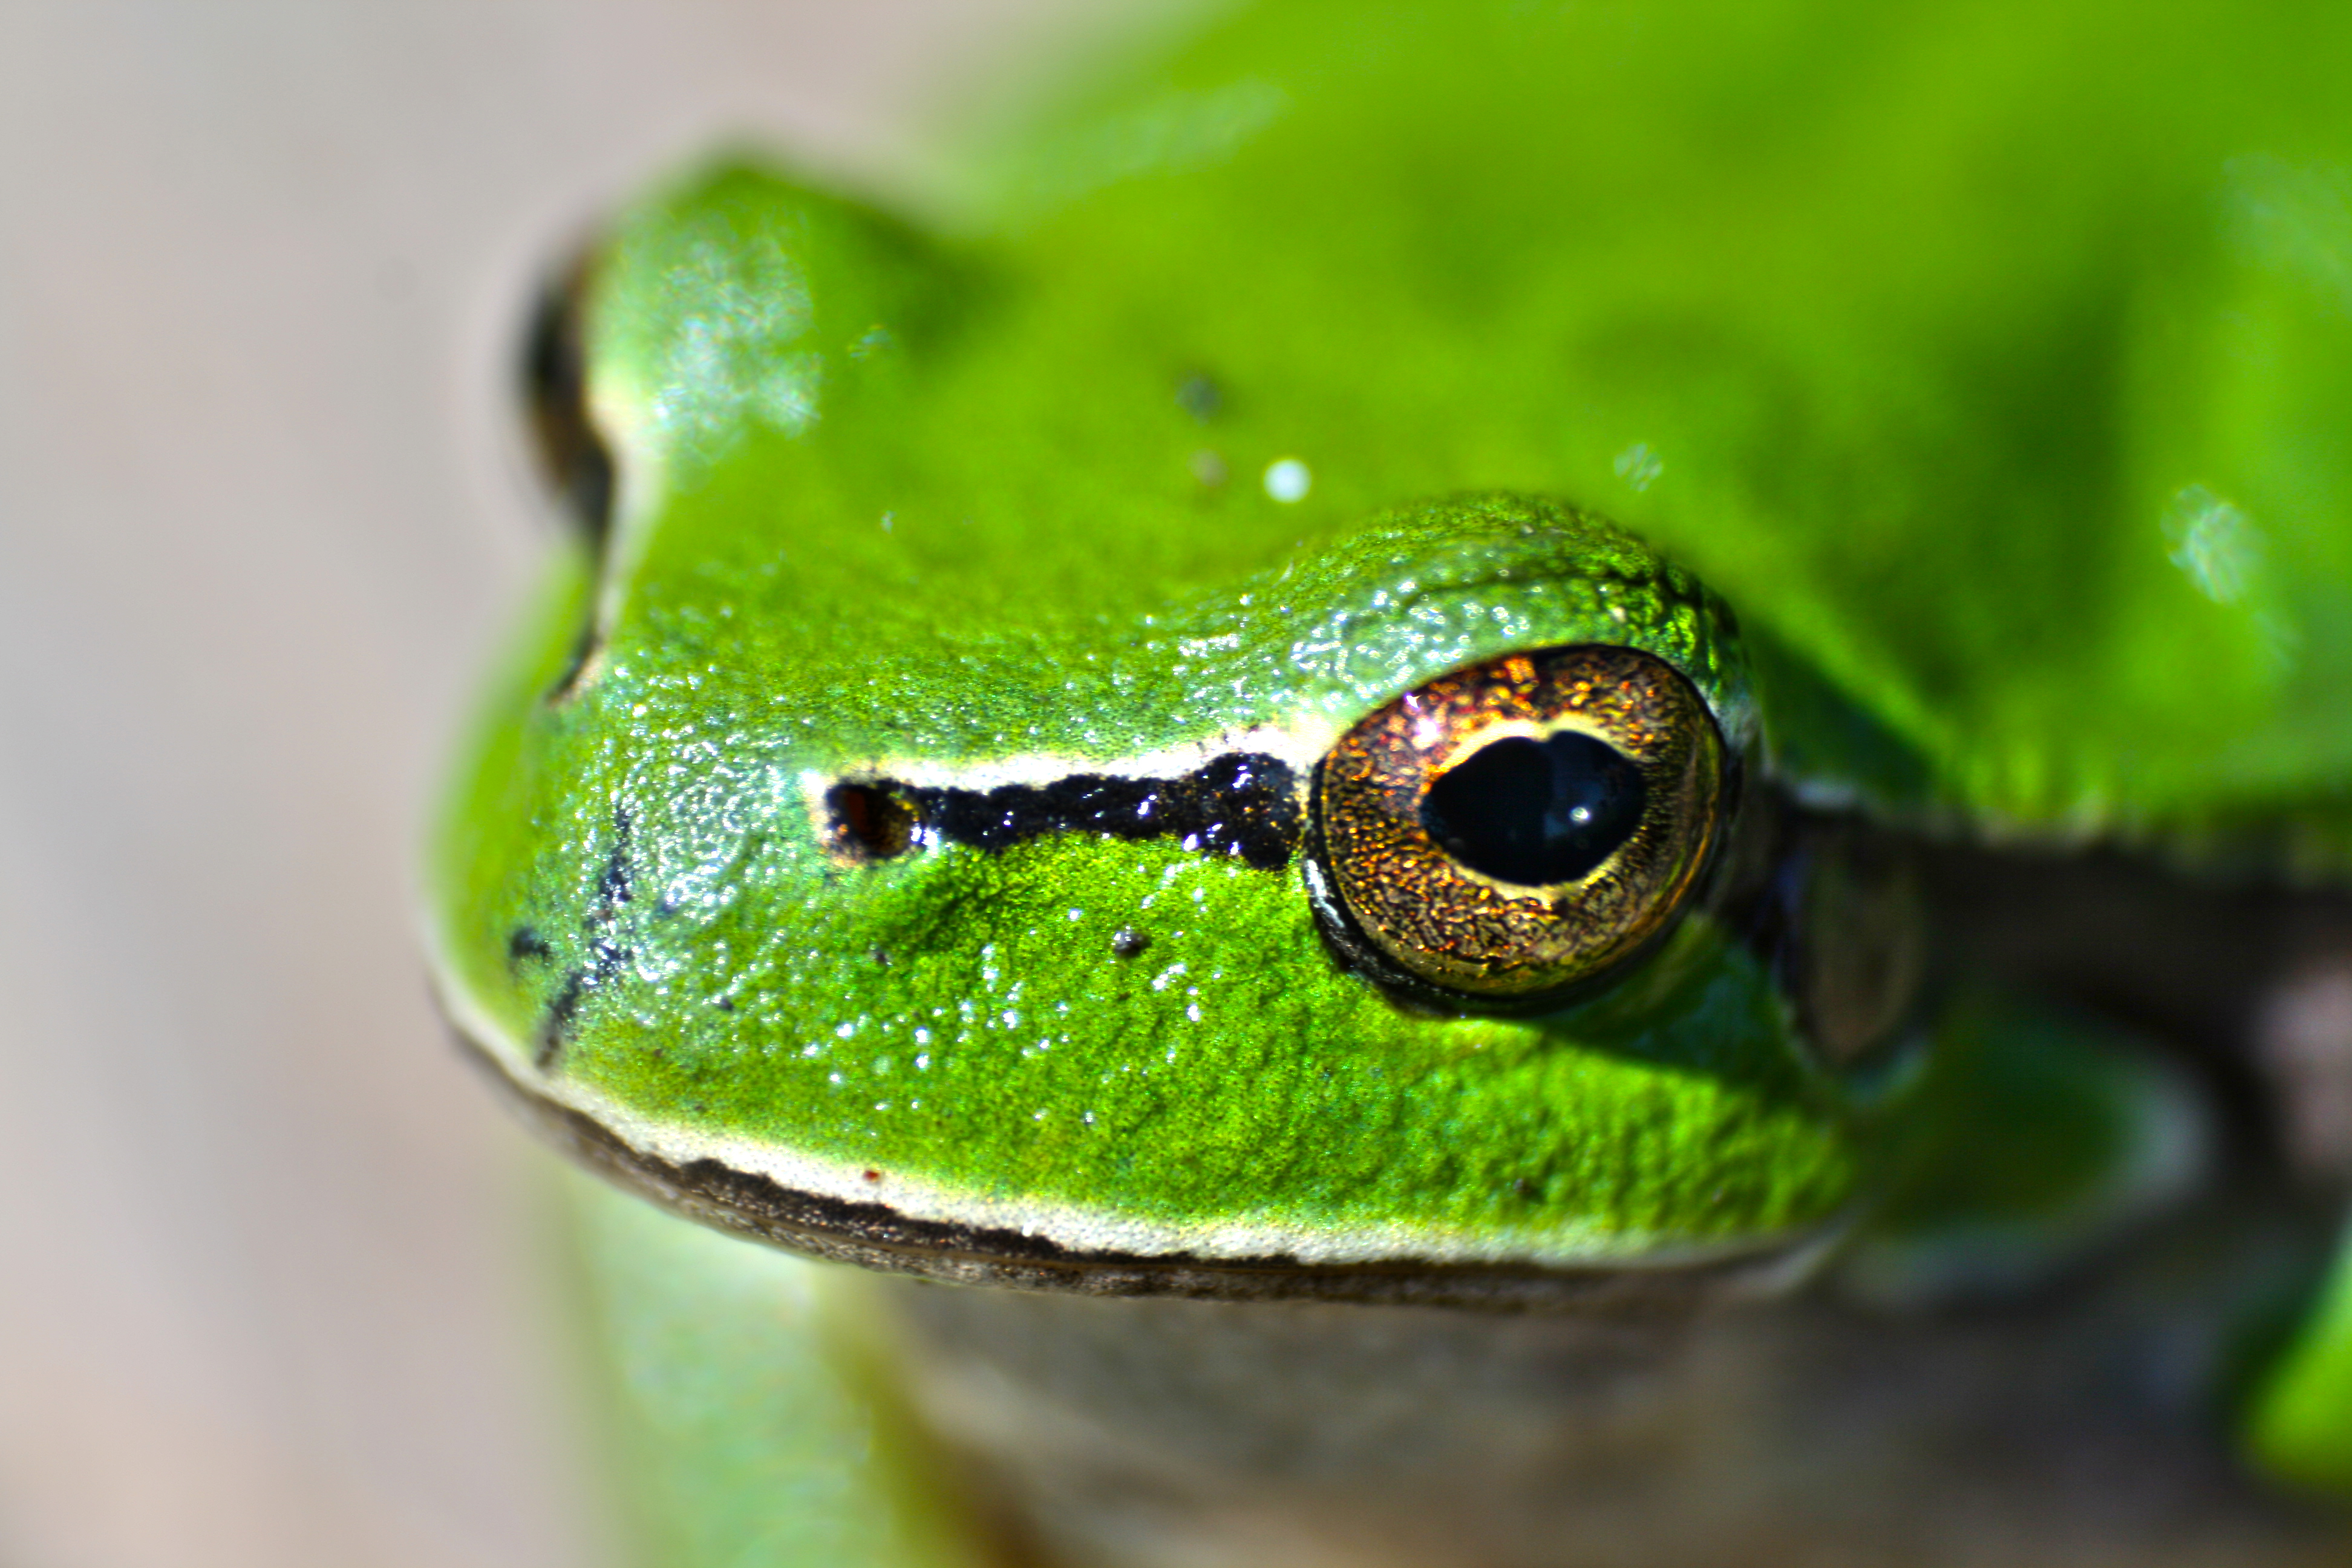 Frog eyes, frog, eyes, green, animals, toad